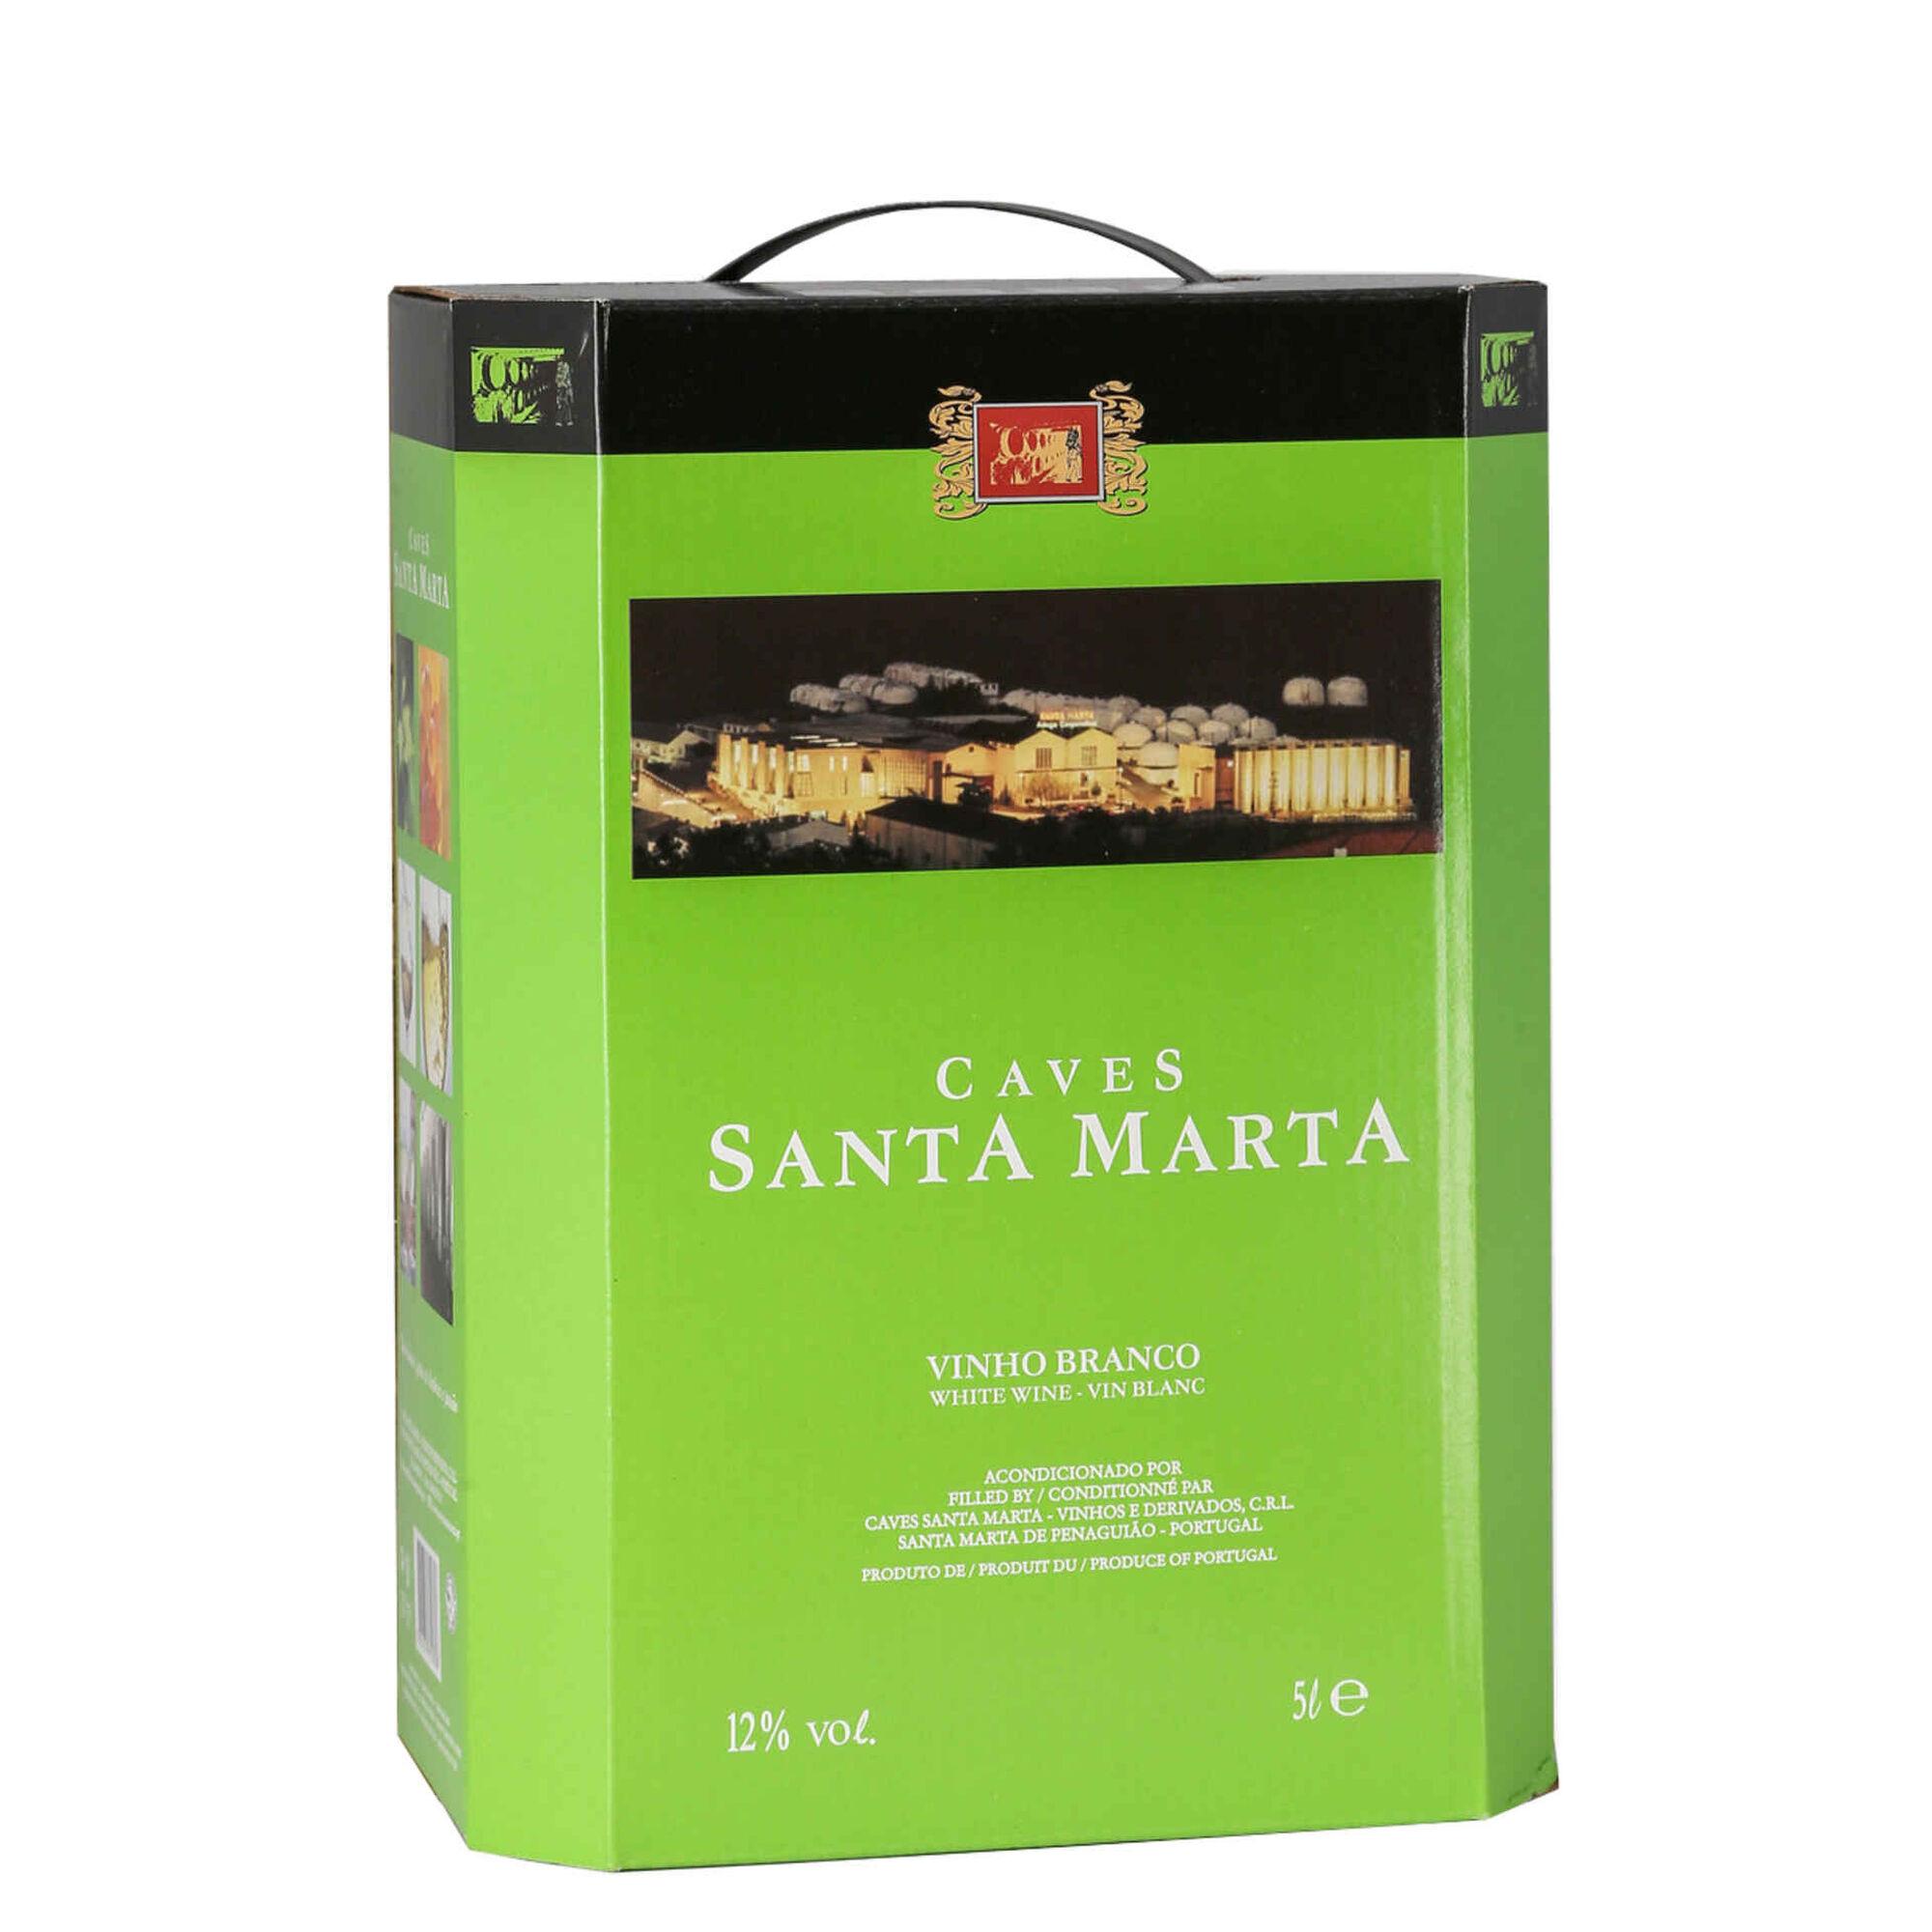 Caves Santa Marta Vinho Branco